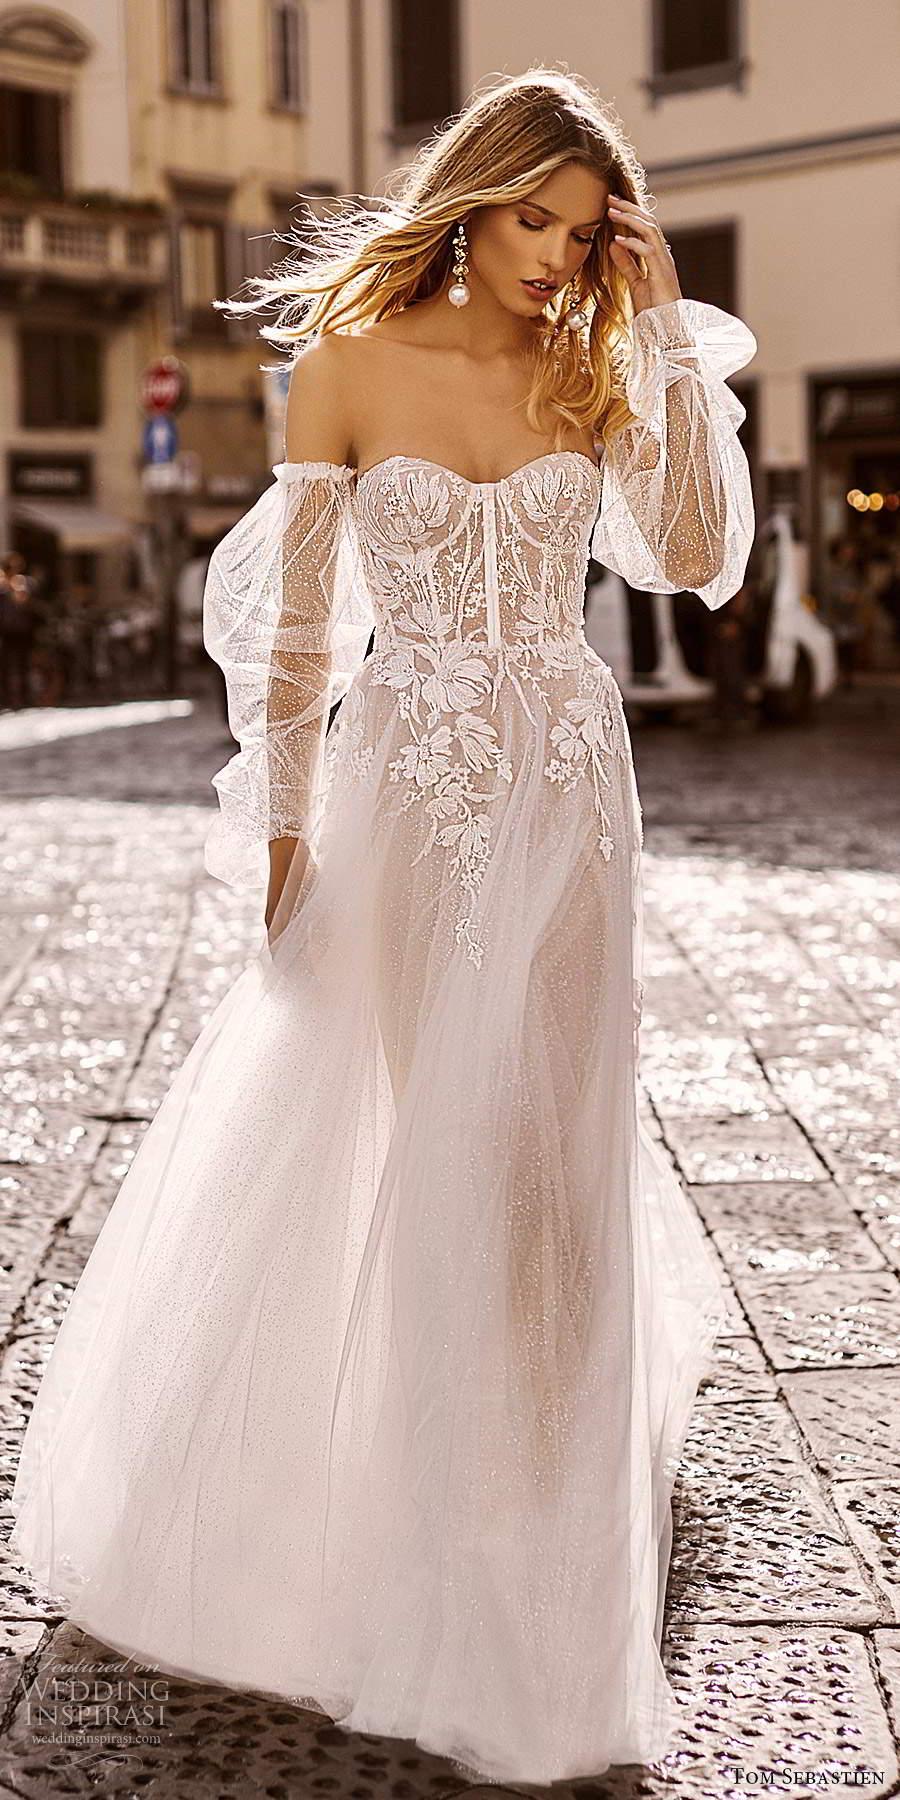 tom sebastien 2020 bridal sheer detached long puff sleeves strapless sweetheart fully embellished a line ball gown wedding dress chapel train (1) mv